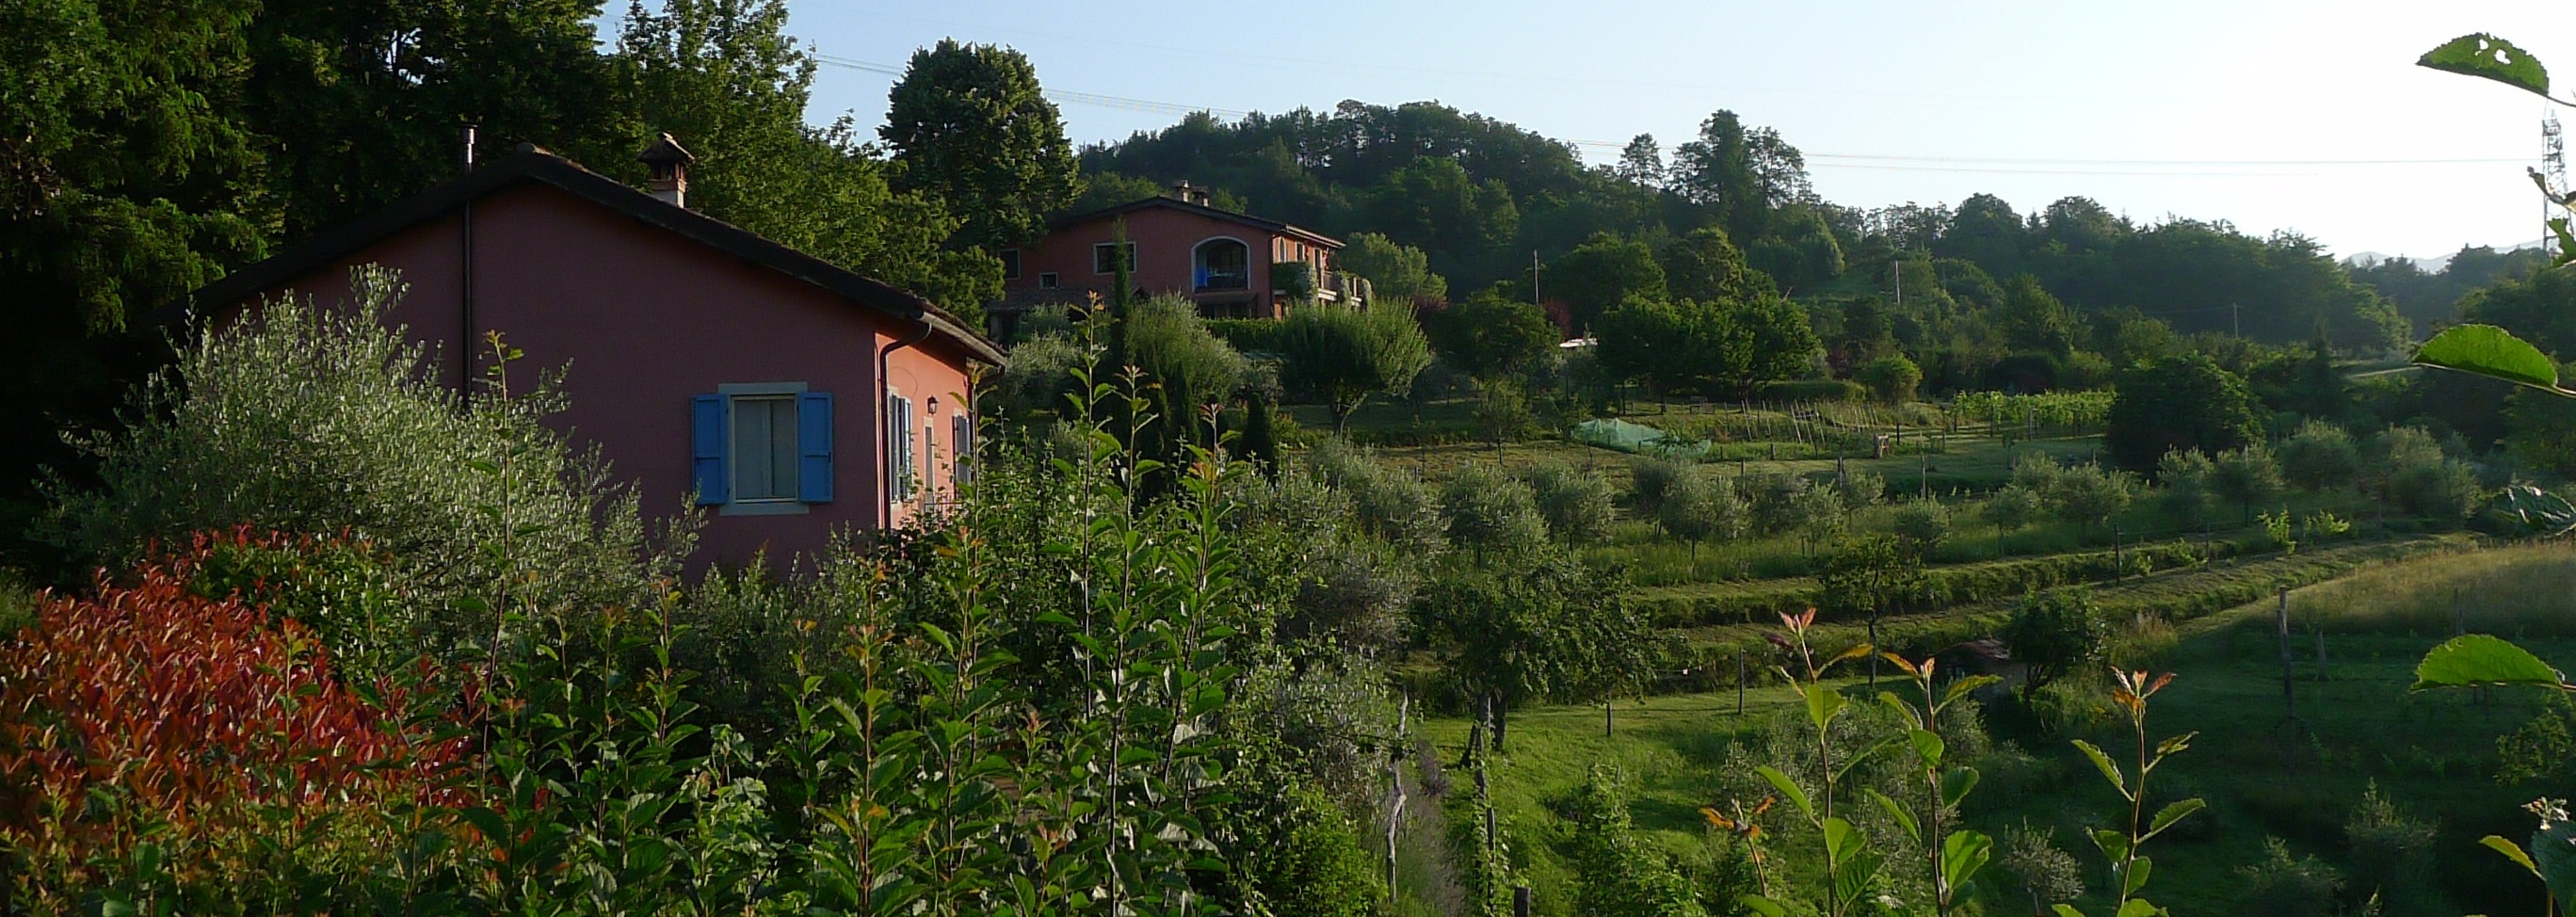 View of Col di Lavacchio Agriturismo, Tuscany